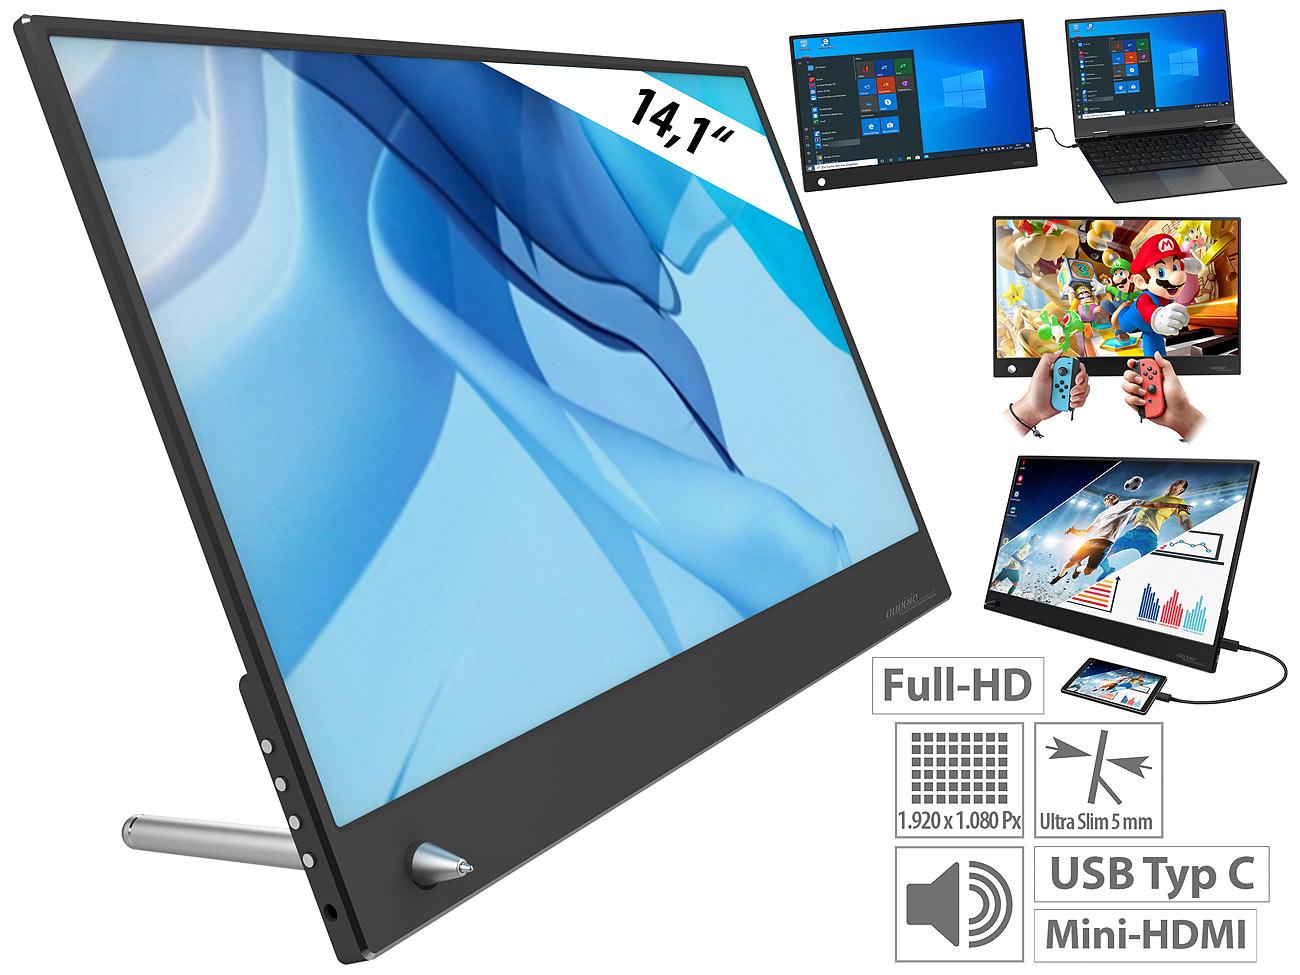 auvisio Ultradünner Full-HD-Monitor EZM-100, 14,1″